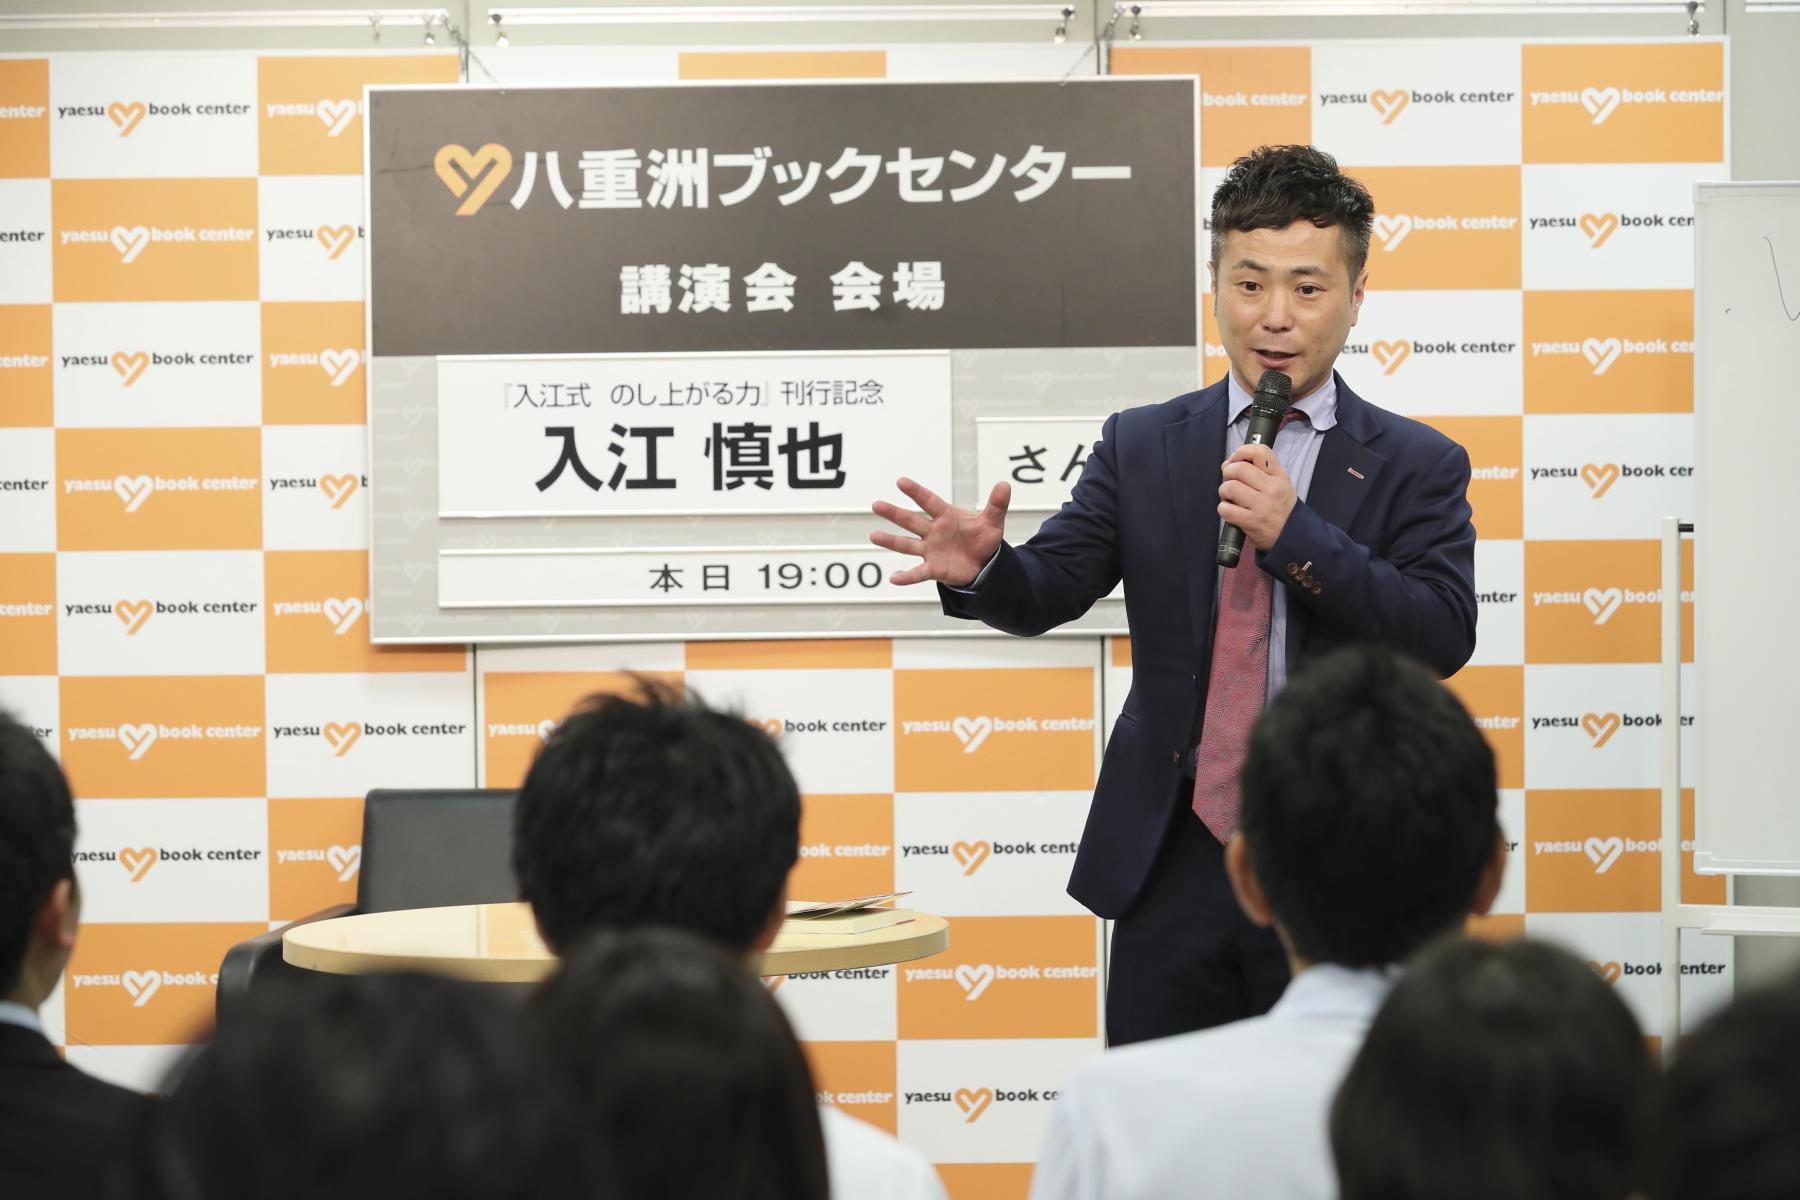 http://news.yoshimoto.co.jp/20180524224729-4c8872f4f4c130081ace744a352d420543956d4e.jpg